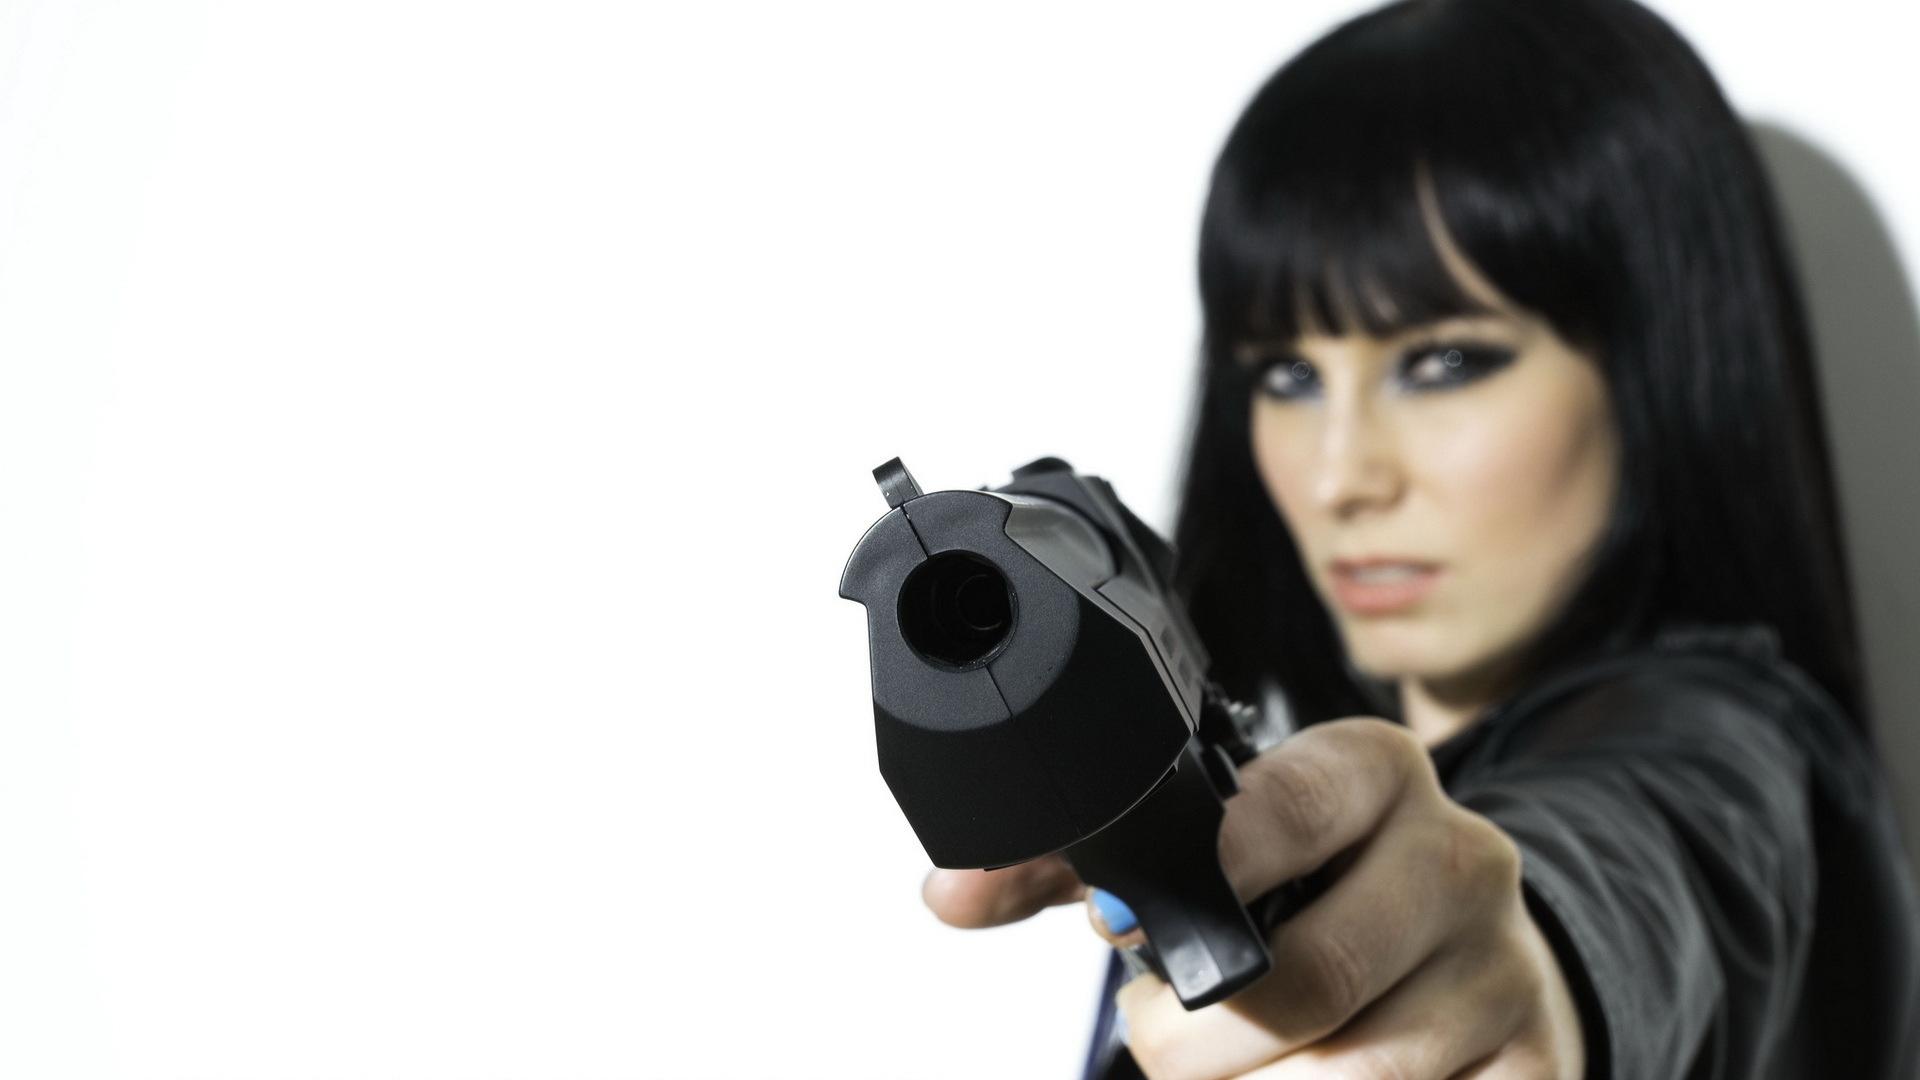 Copia di beautiful girl with gun wallpaper